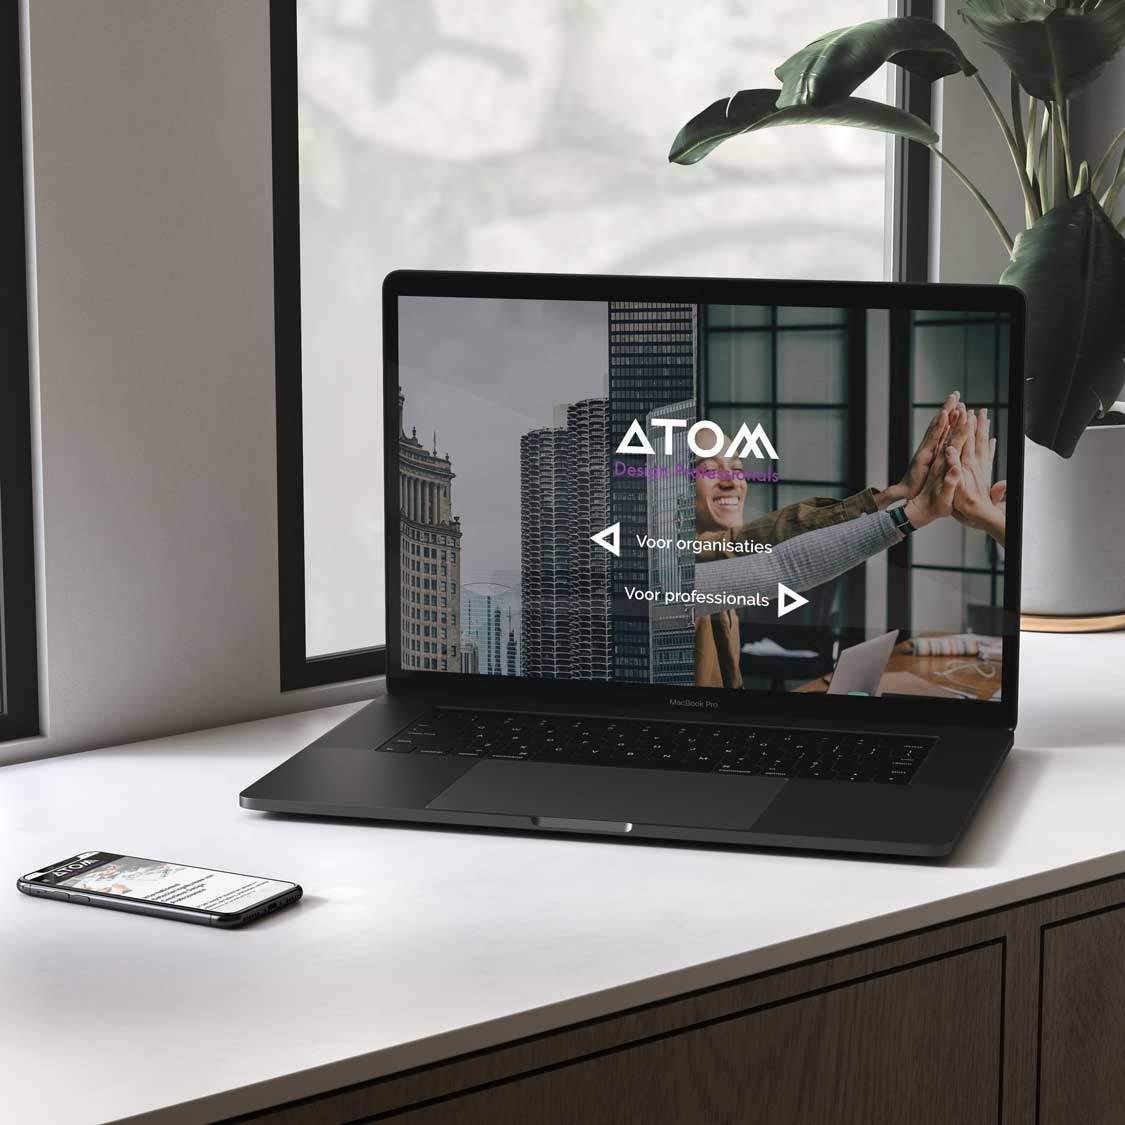 atom-design-professionals-online-marketing-bureau-webdevelopment-haarlem-made-marketing-1